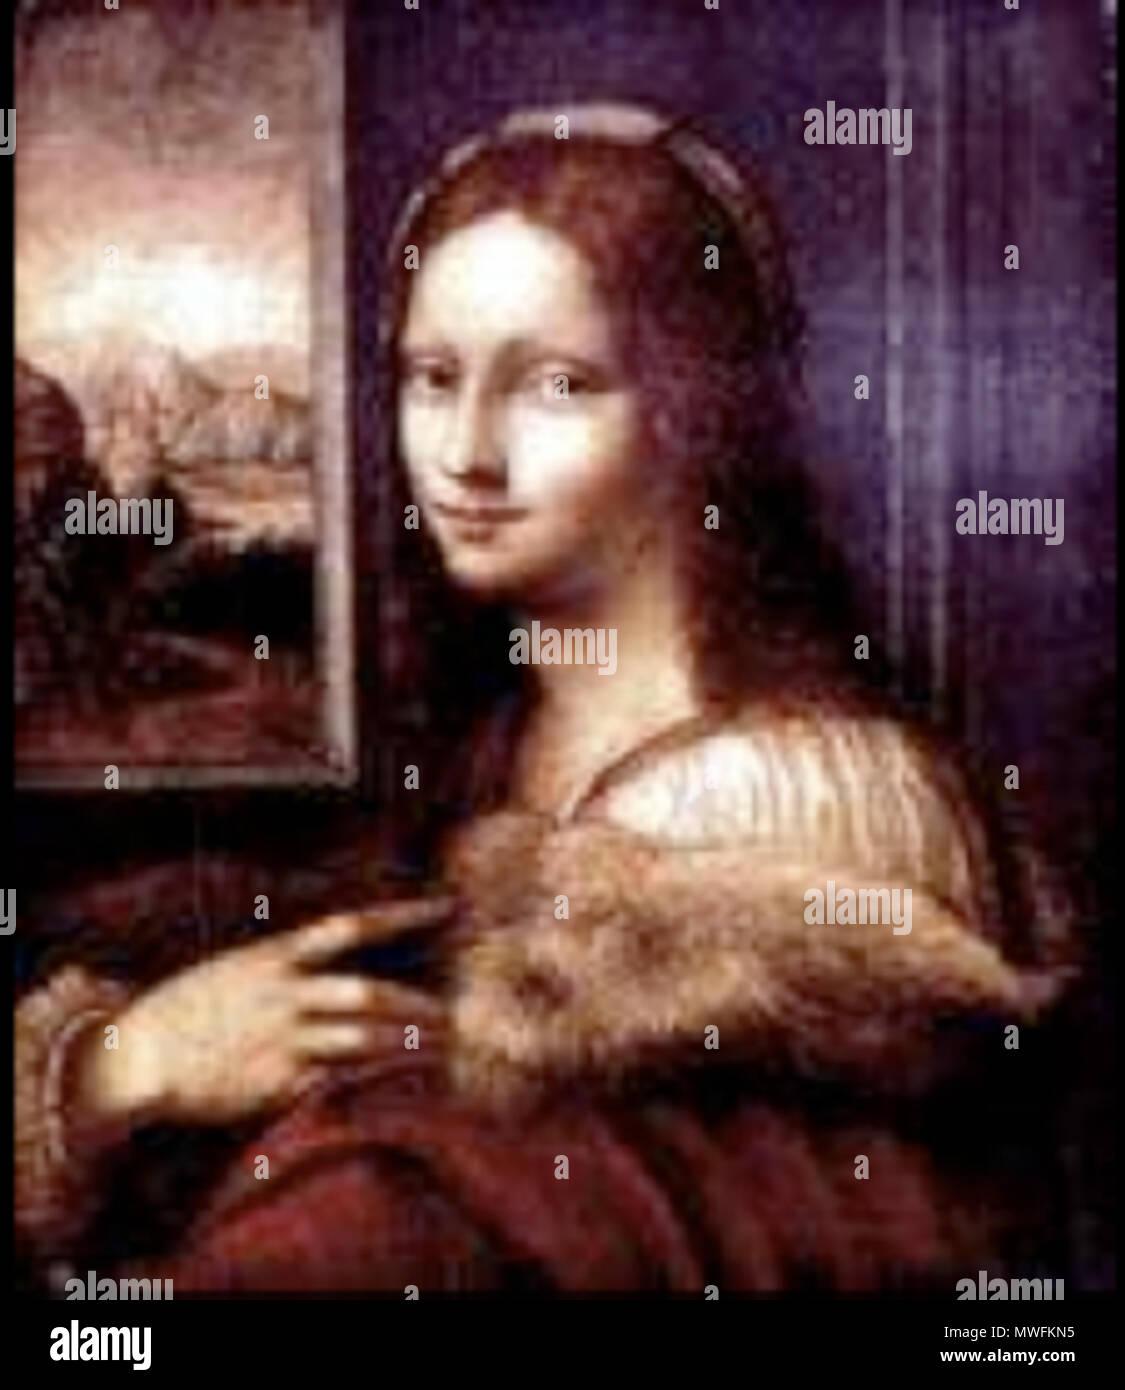 Watch 1. Painting attributed to Leonardo da Vinci, Salvator Mundi — 450.3 million video